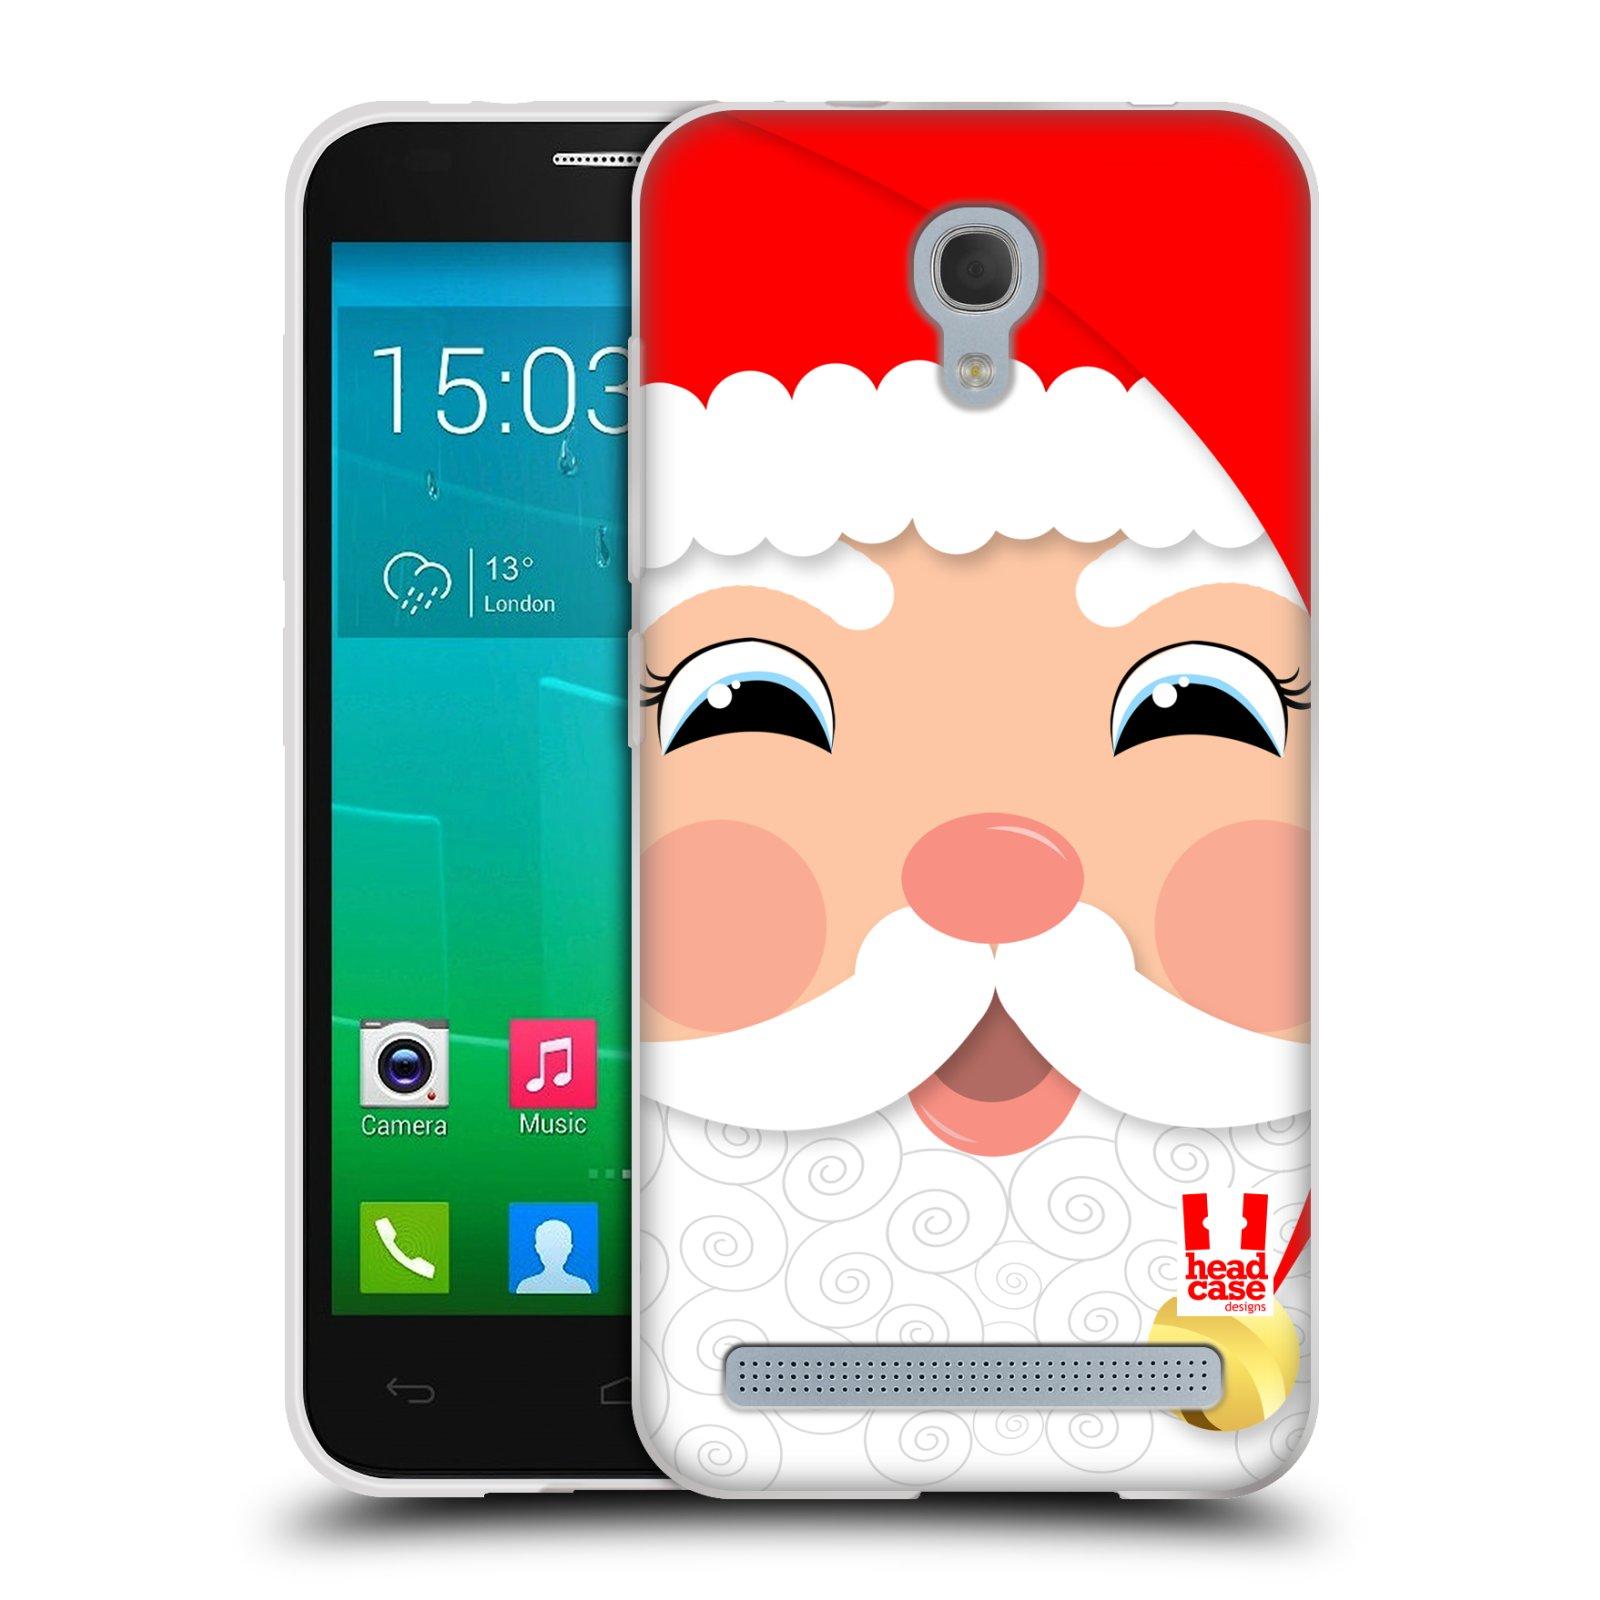 Silikonové pouzdro na mobil Alcatel One Touch Idol 2 Mini S 6036Y HEAD CASE VÁNOCE SANTA (Silikonový kryt či obal na mobilní telefon Alcatel Idol 2 Mini S OT-6036Y)